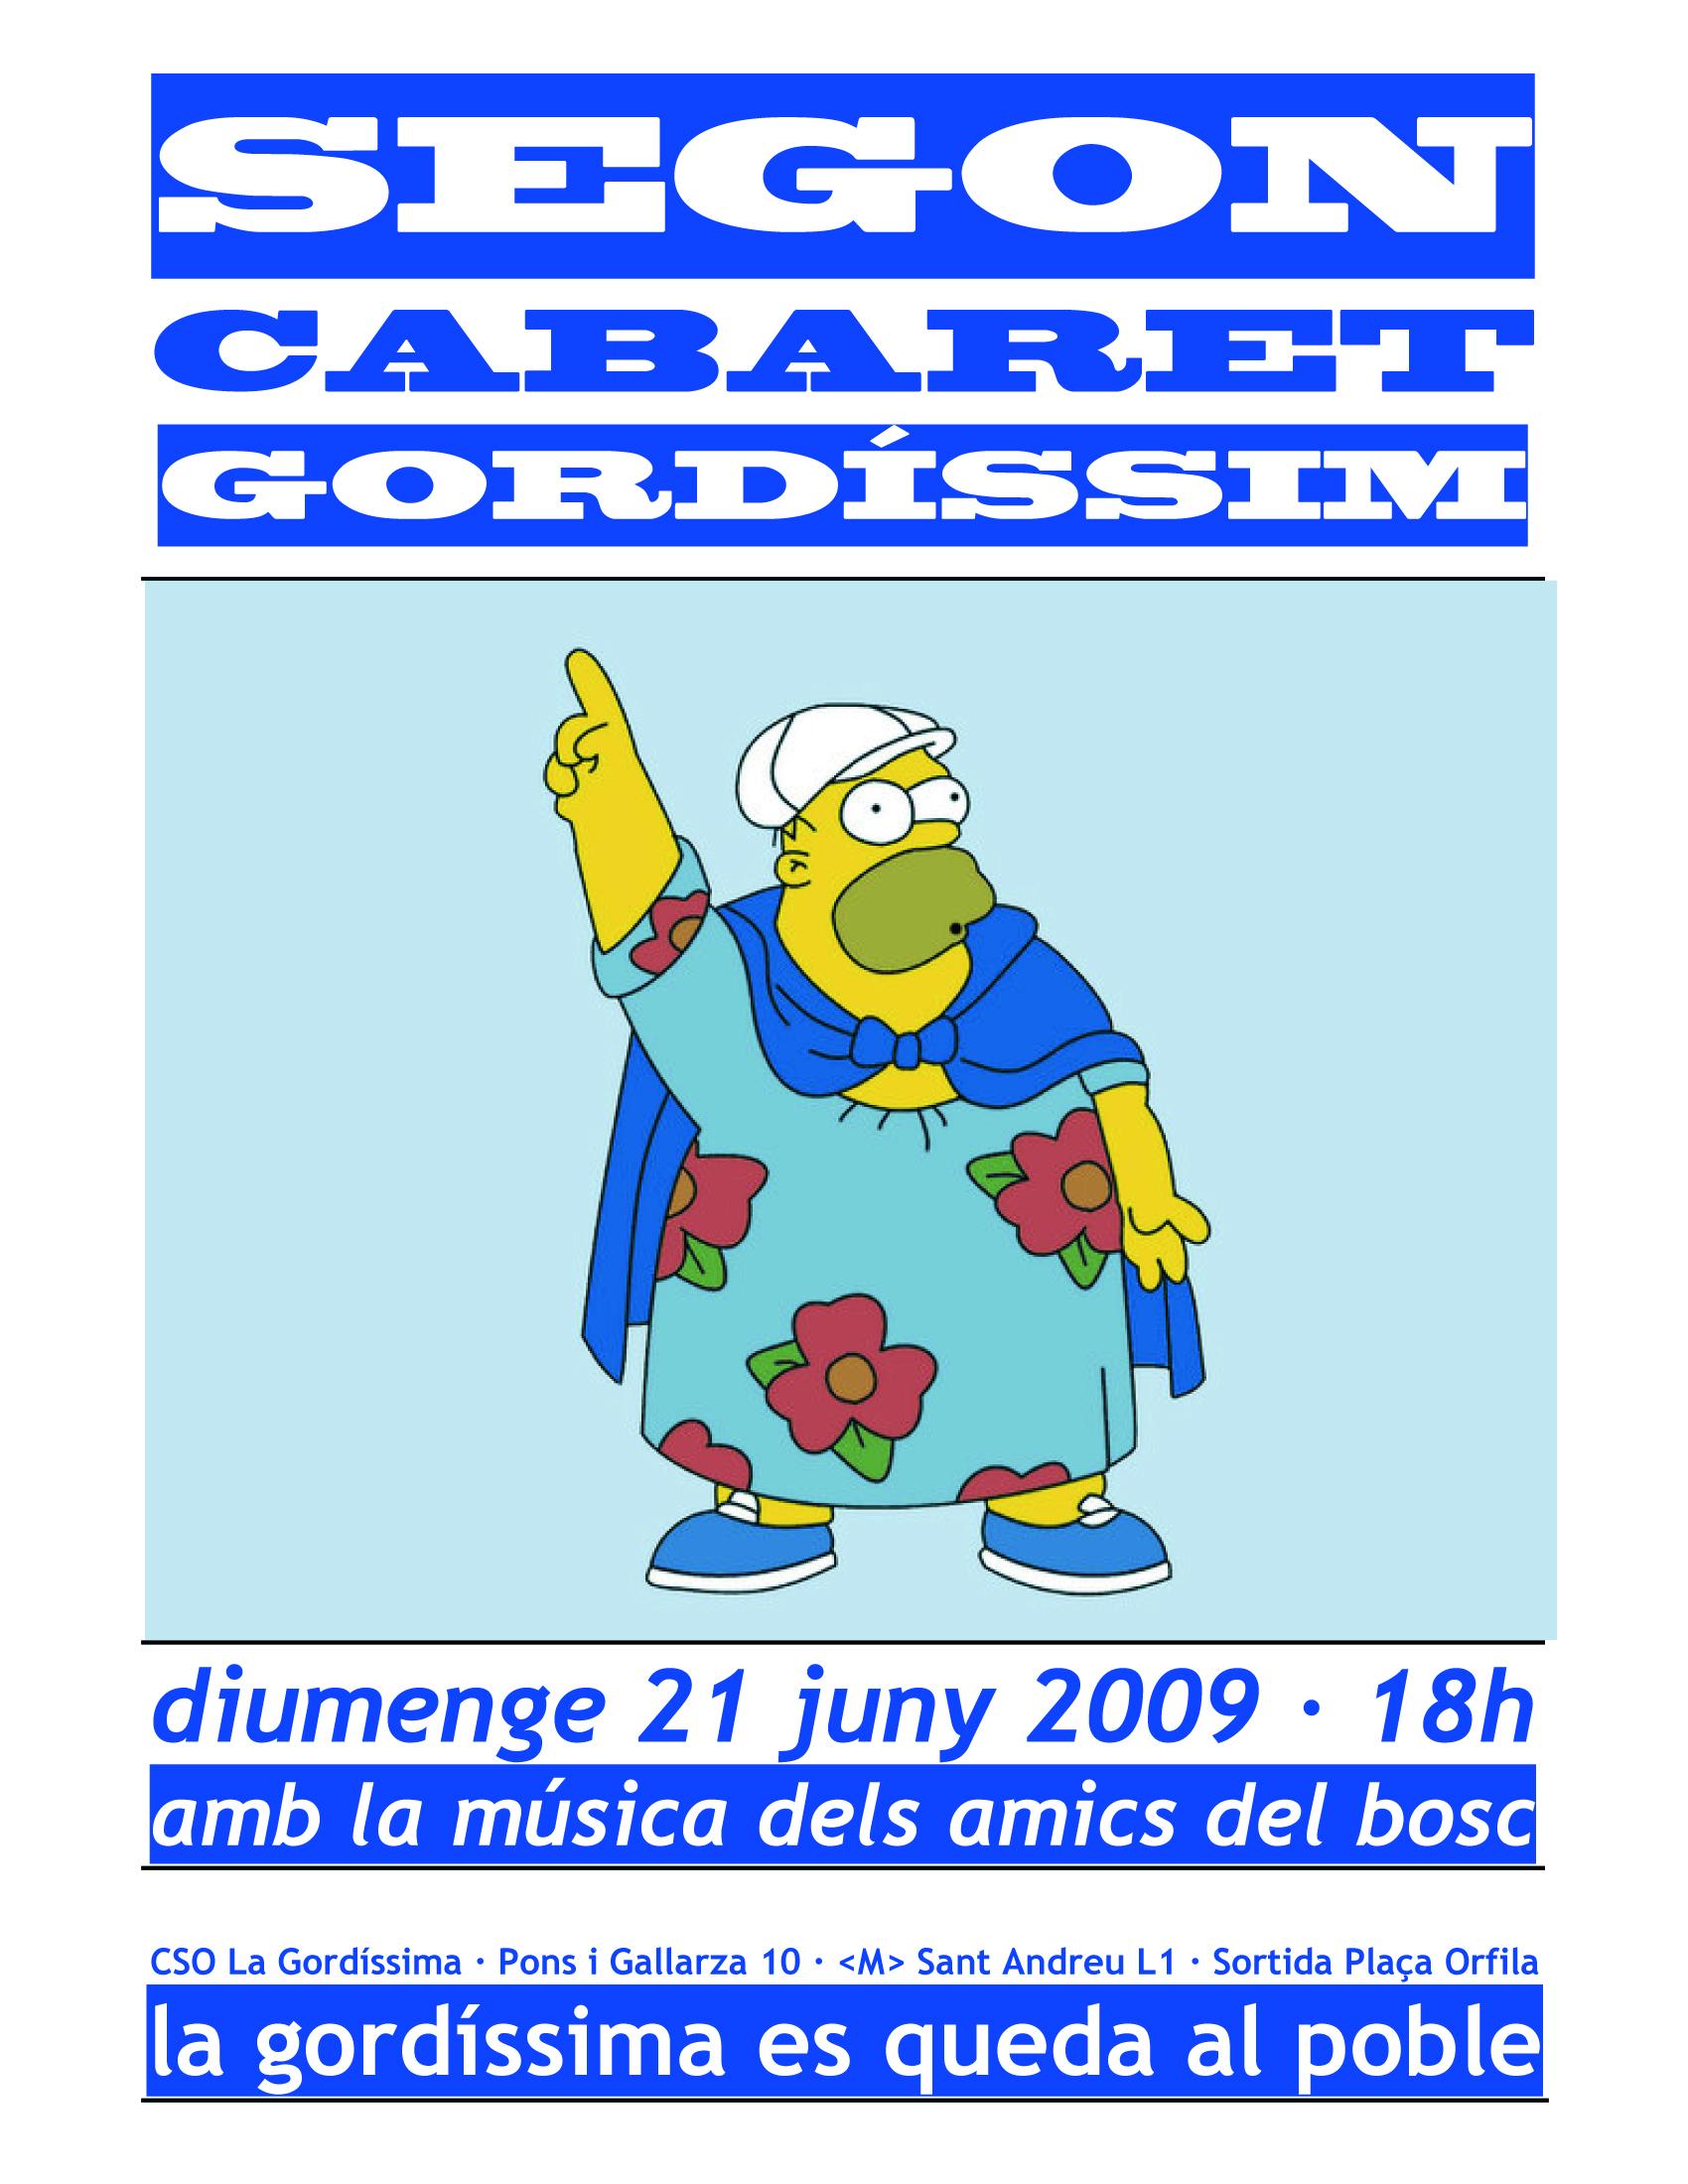 Microsoft Word - poster a4 gordi. juny 2009.doc